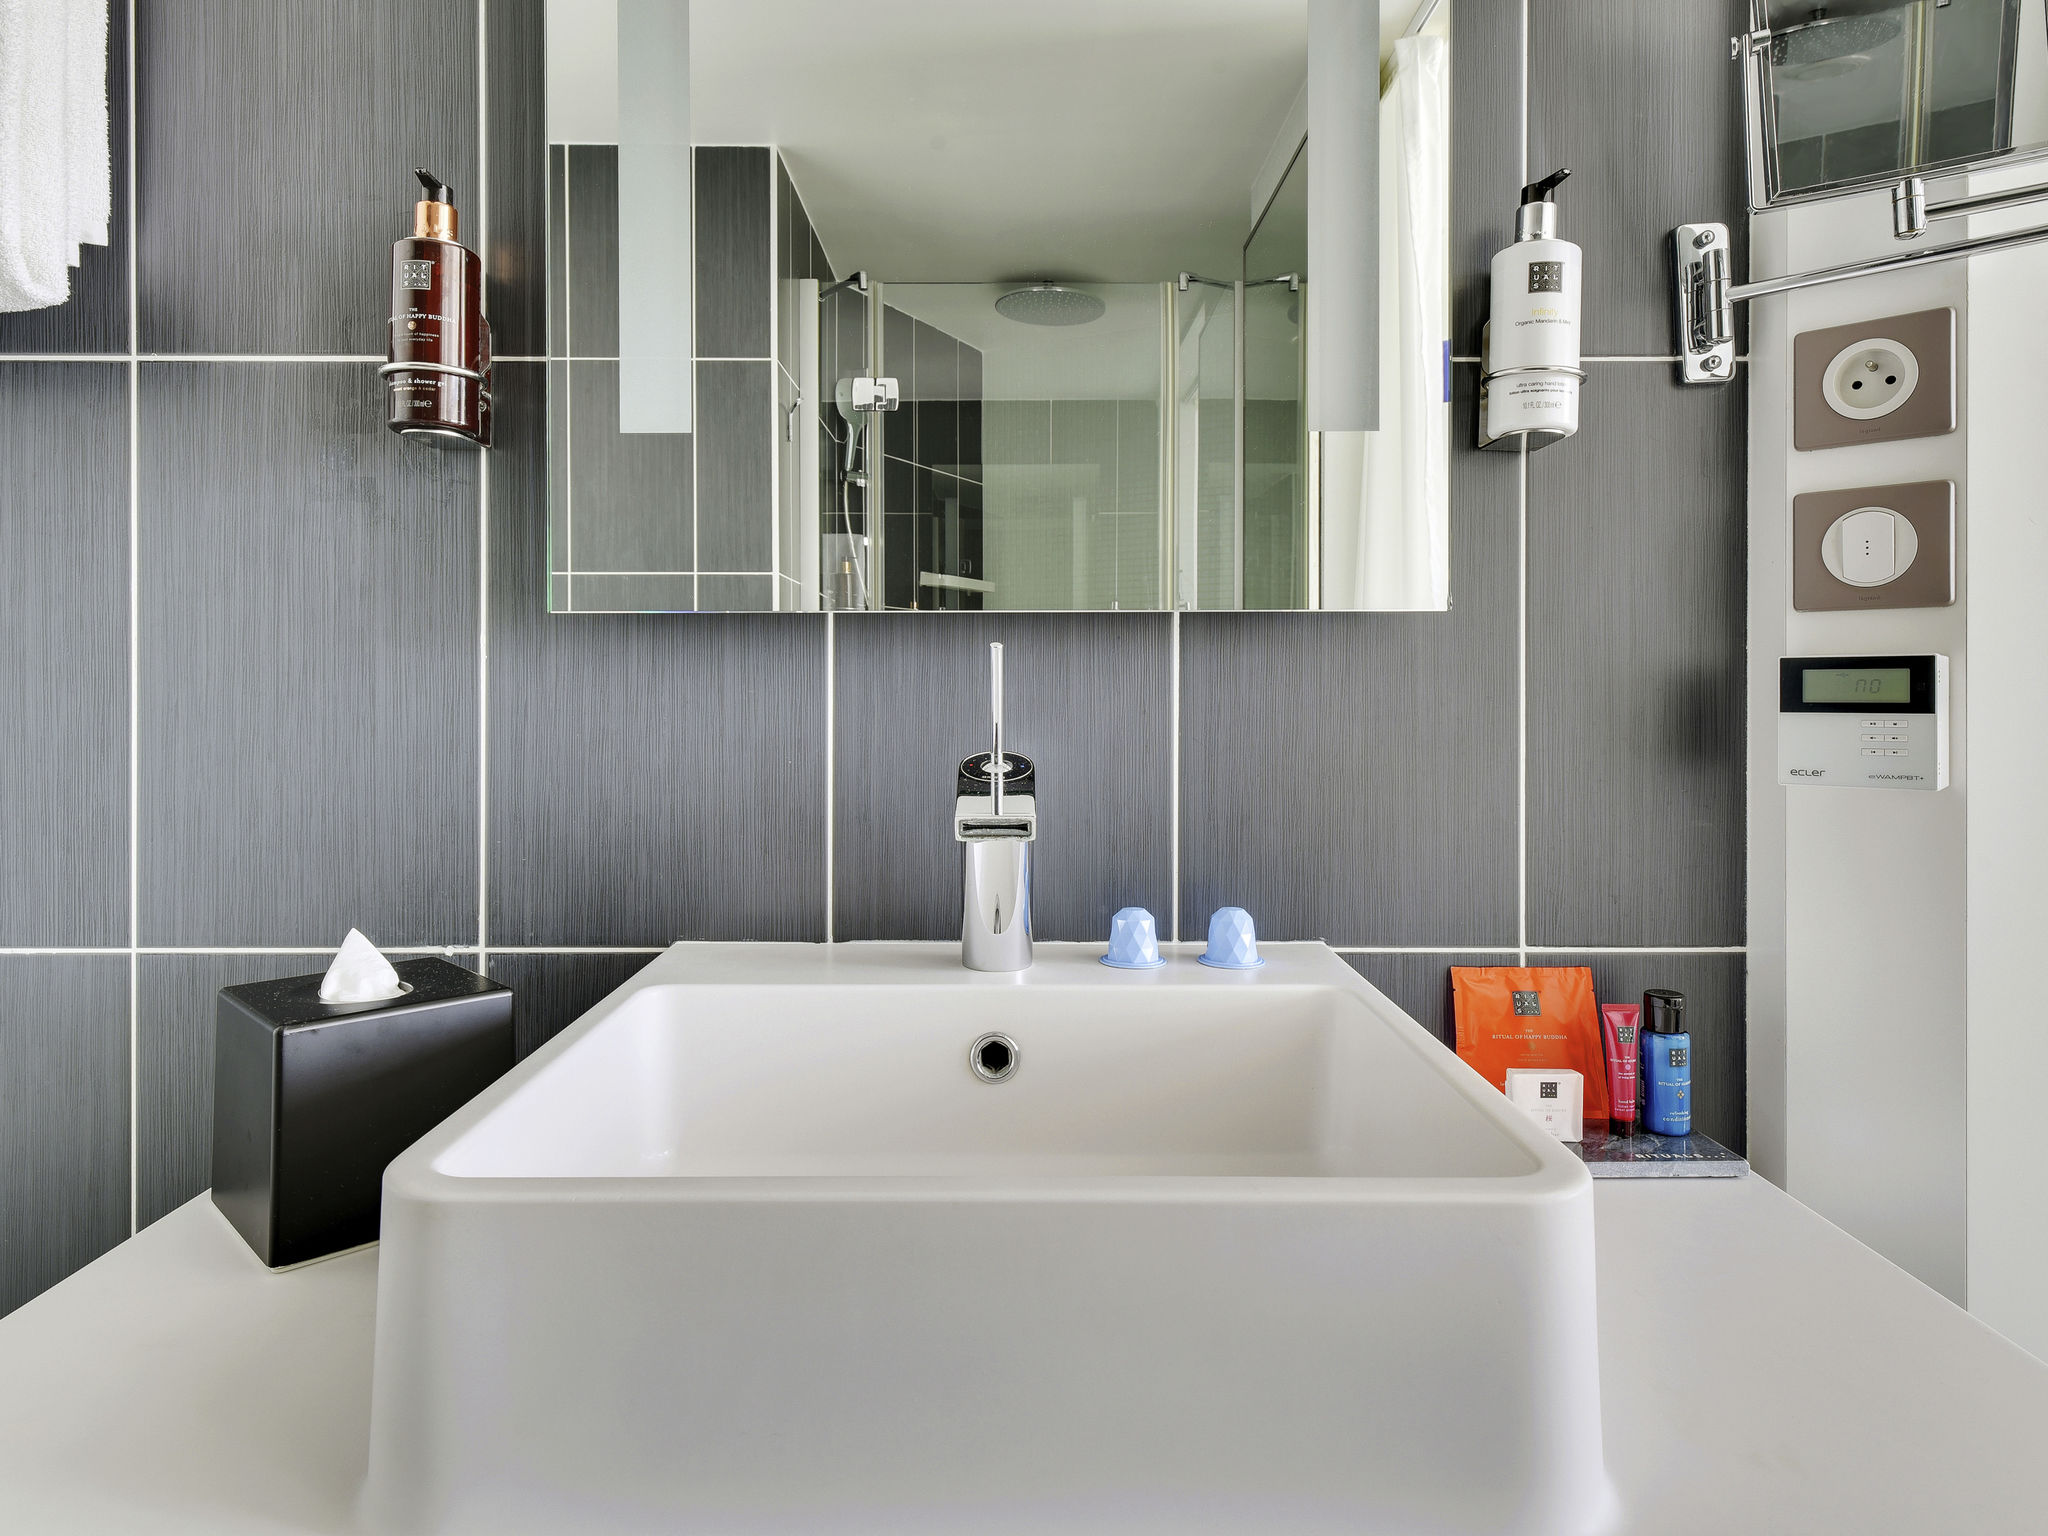 Villa montmorency an exclusive home in paris actualités belles